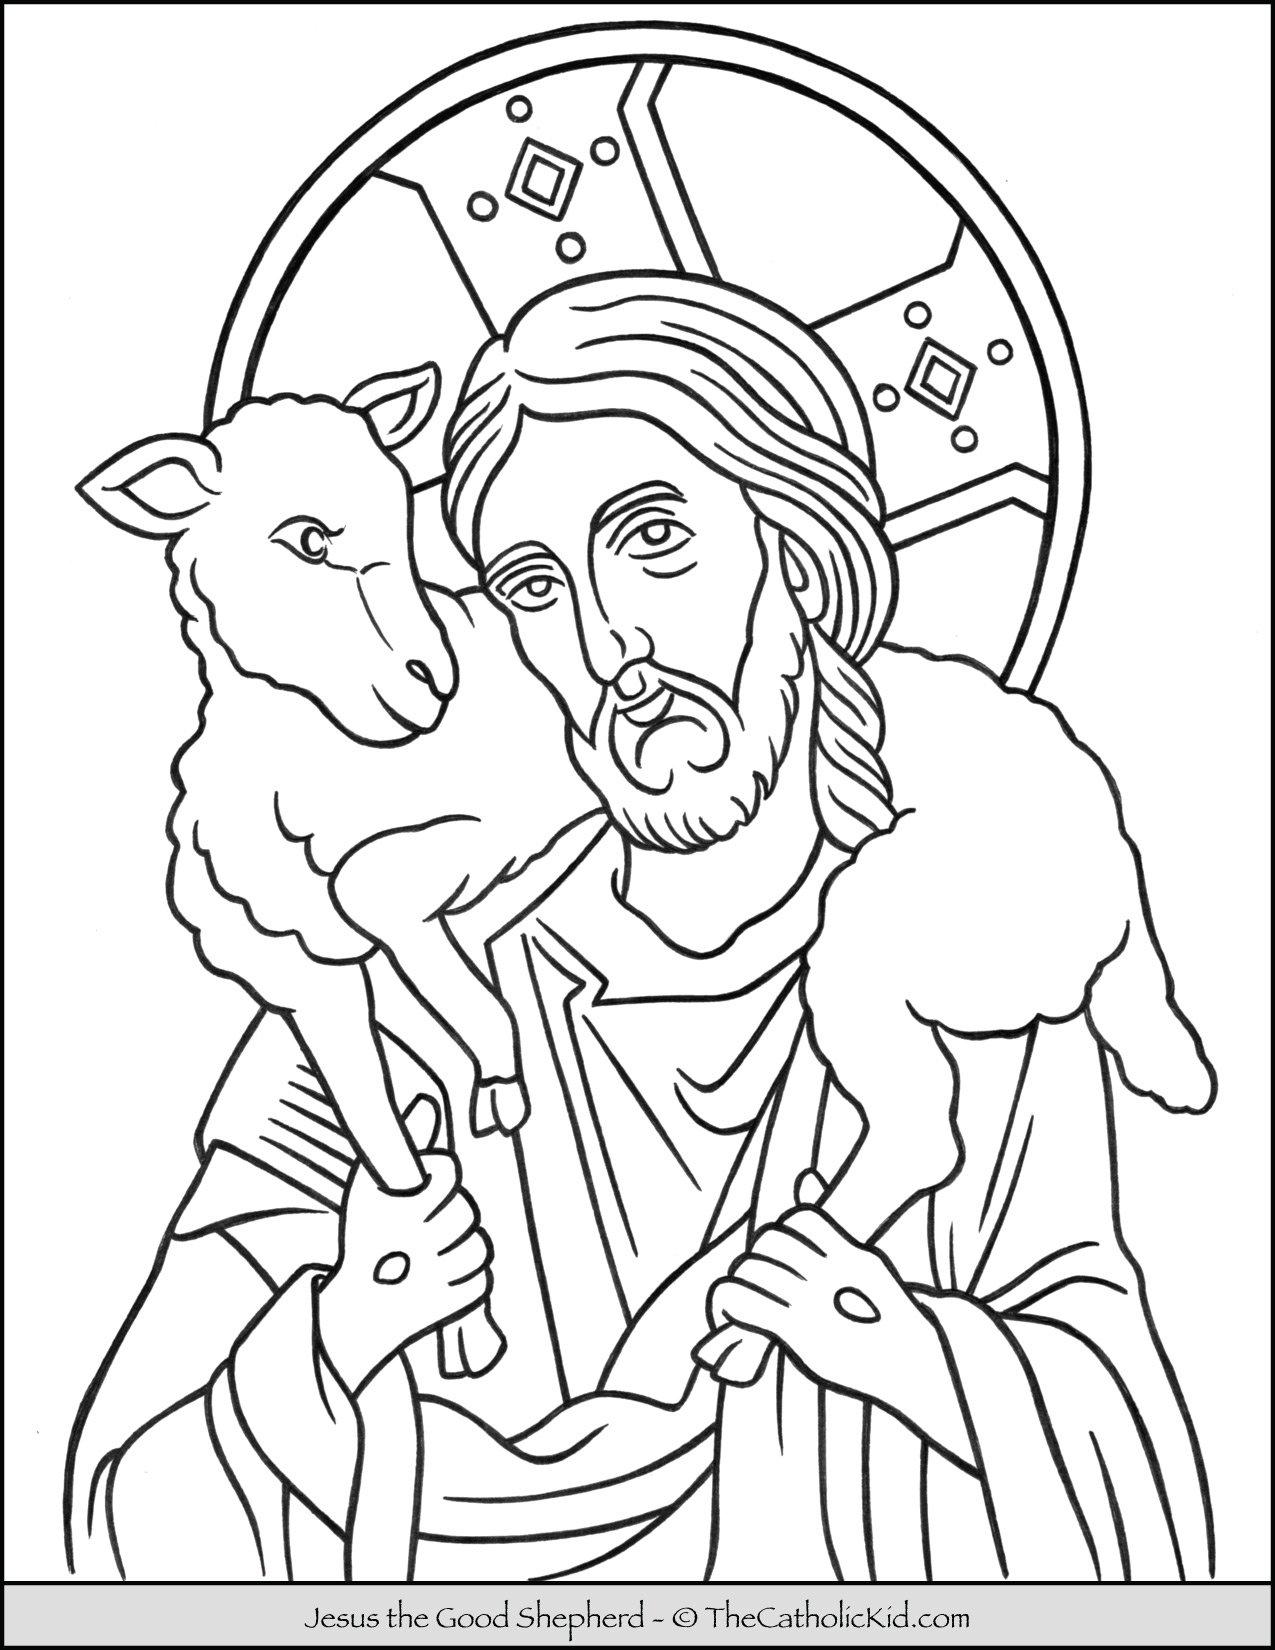 Jesus the Good Shepherd Coloring Page